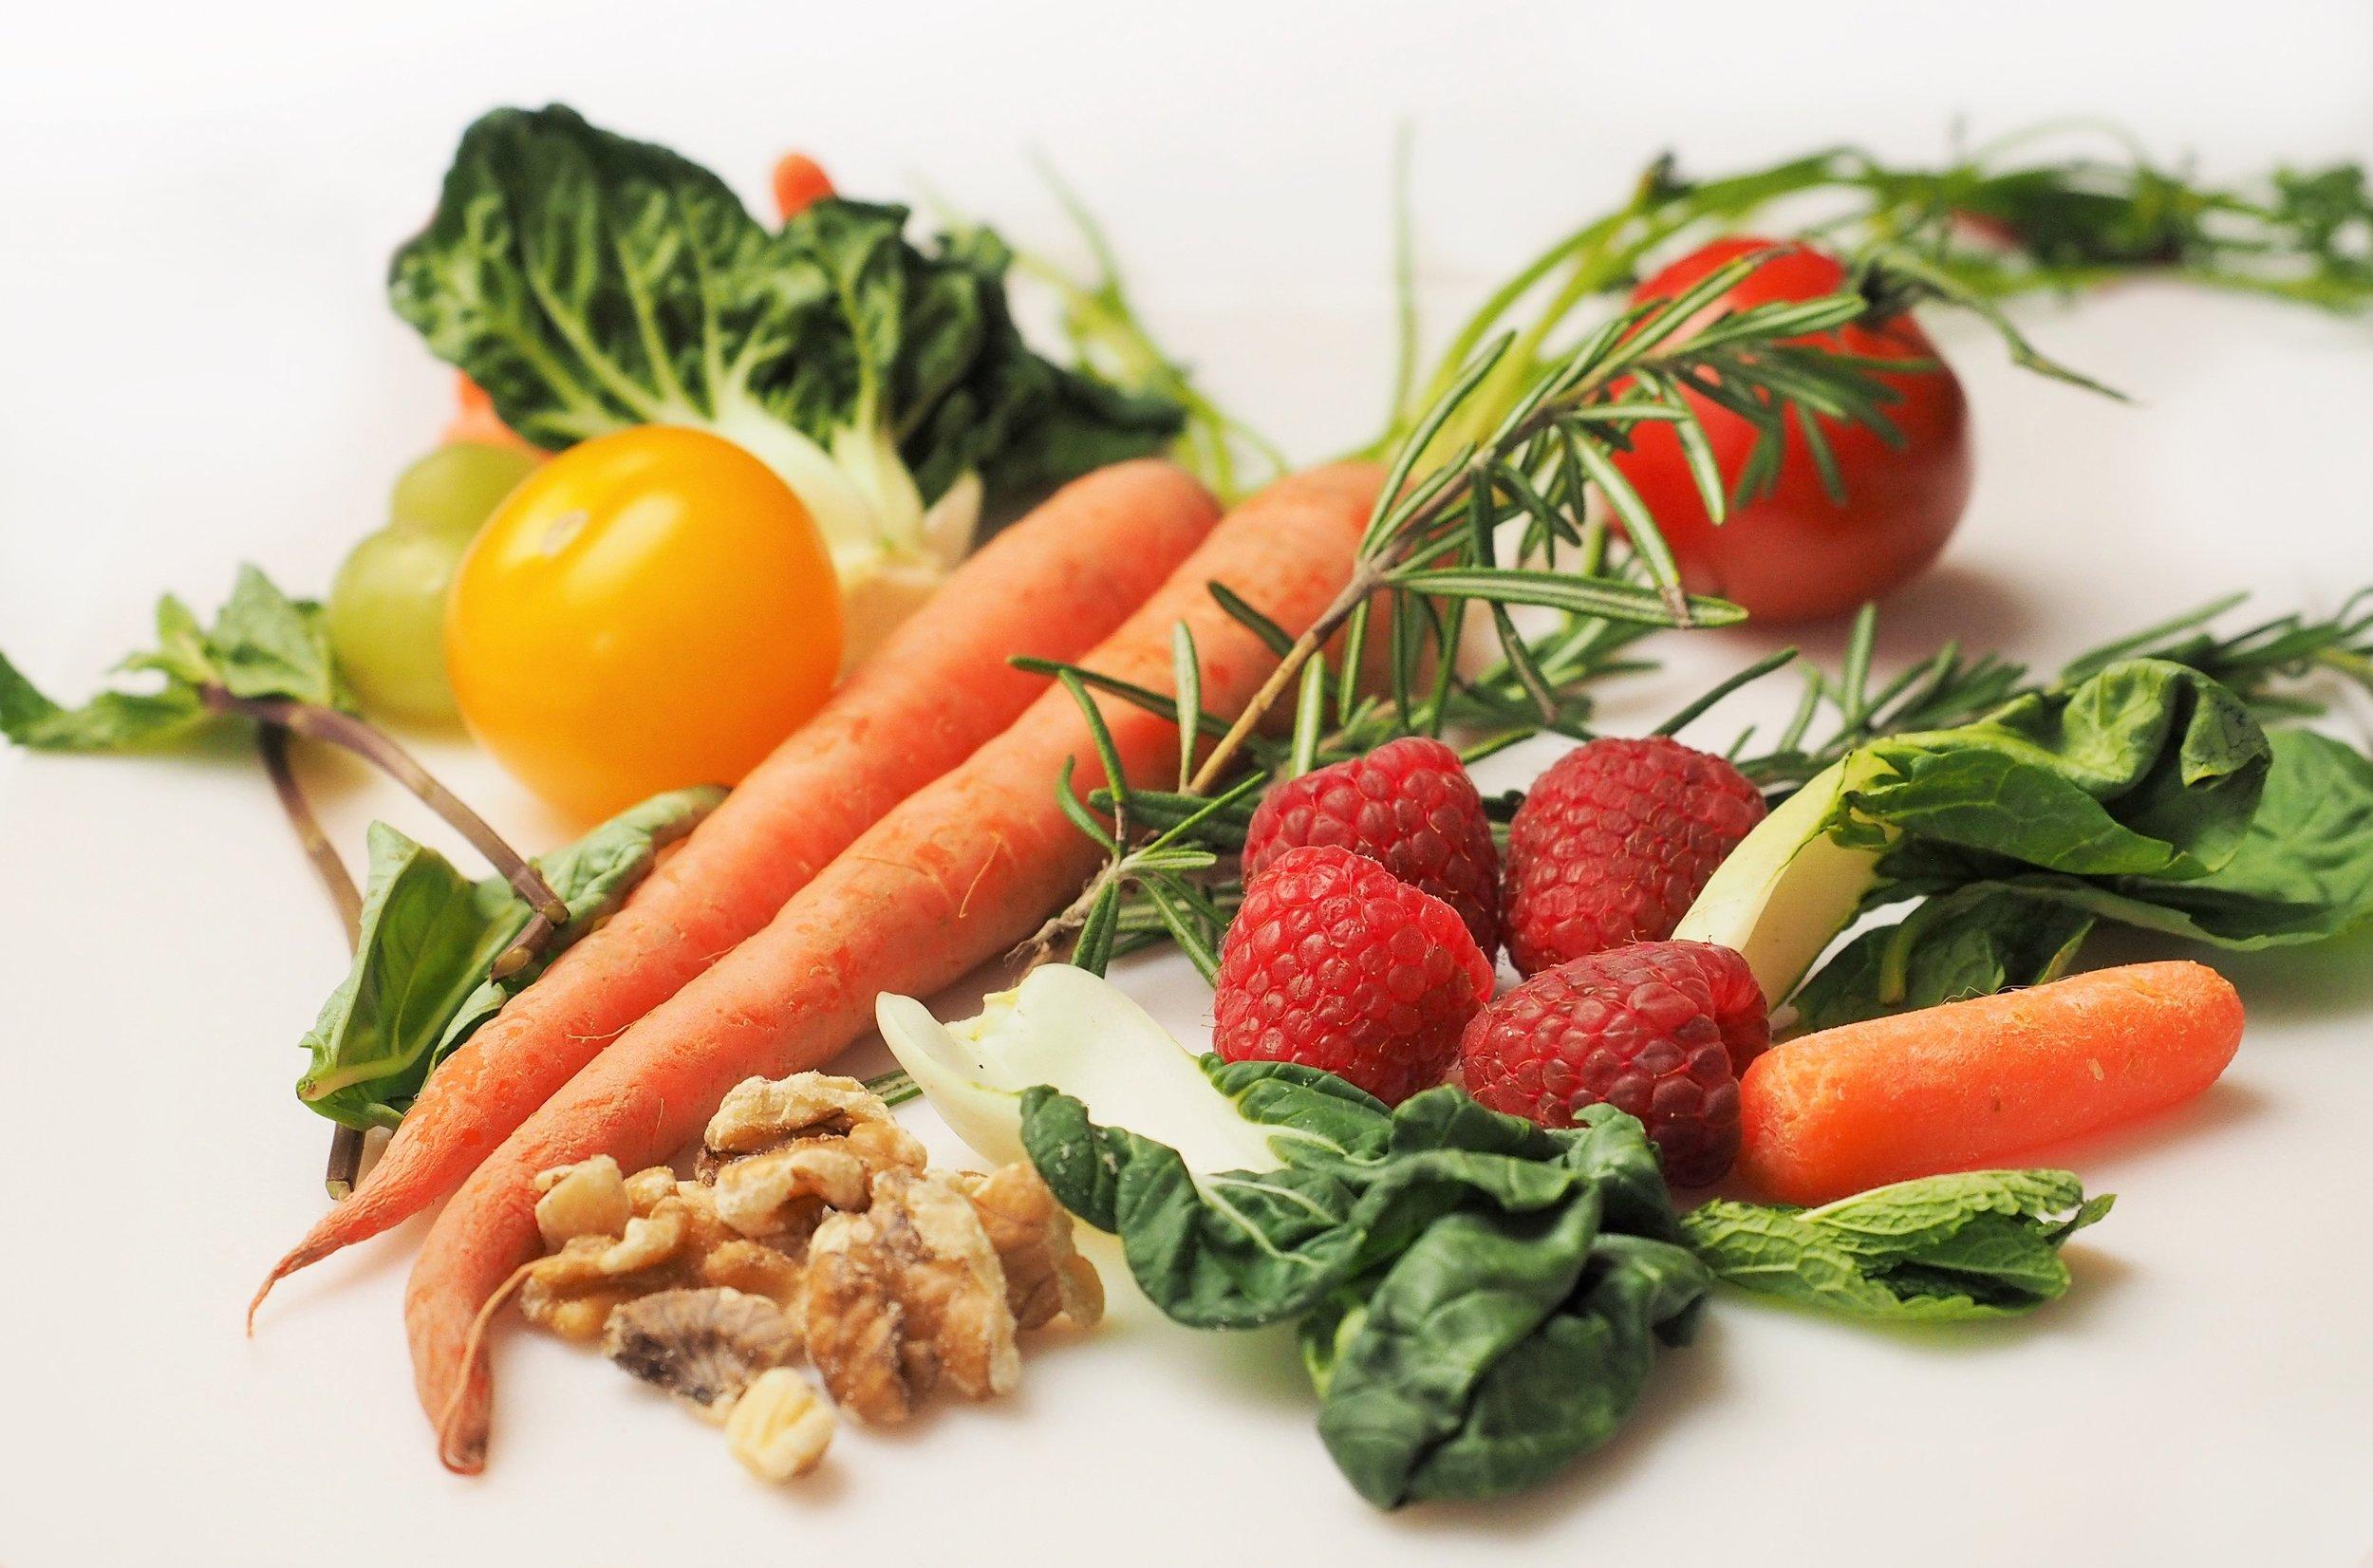 105 agriculture-antioxidant-carrot-33307.jpg